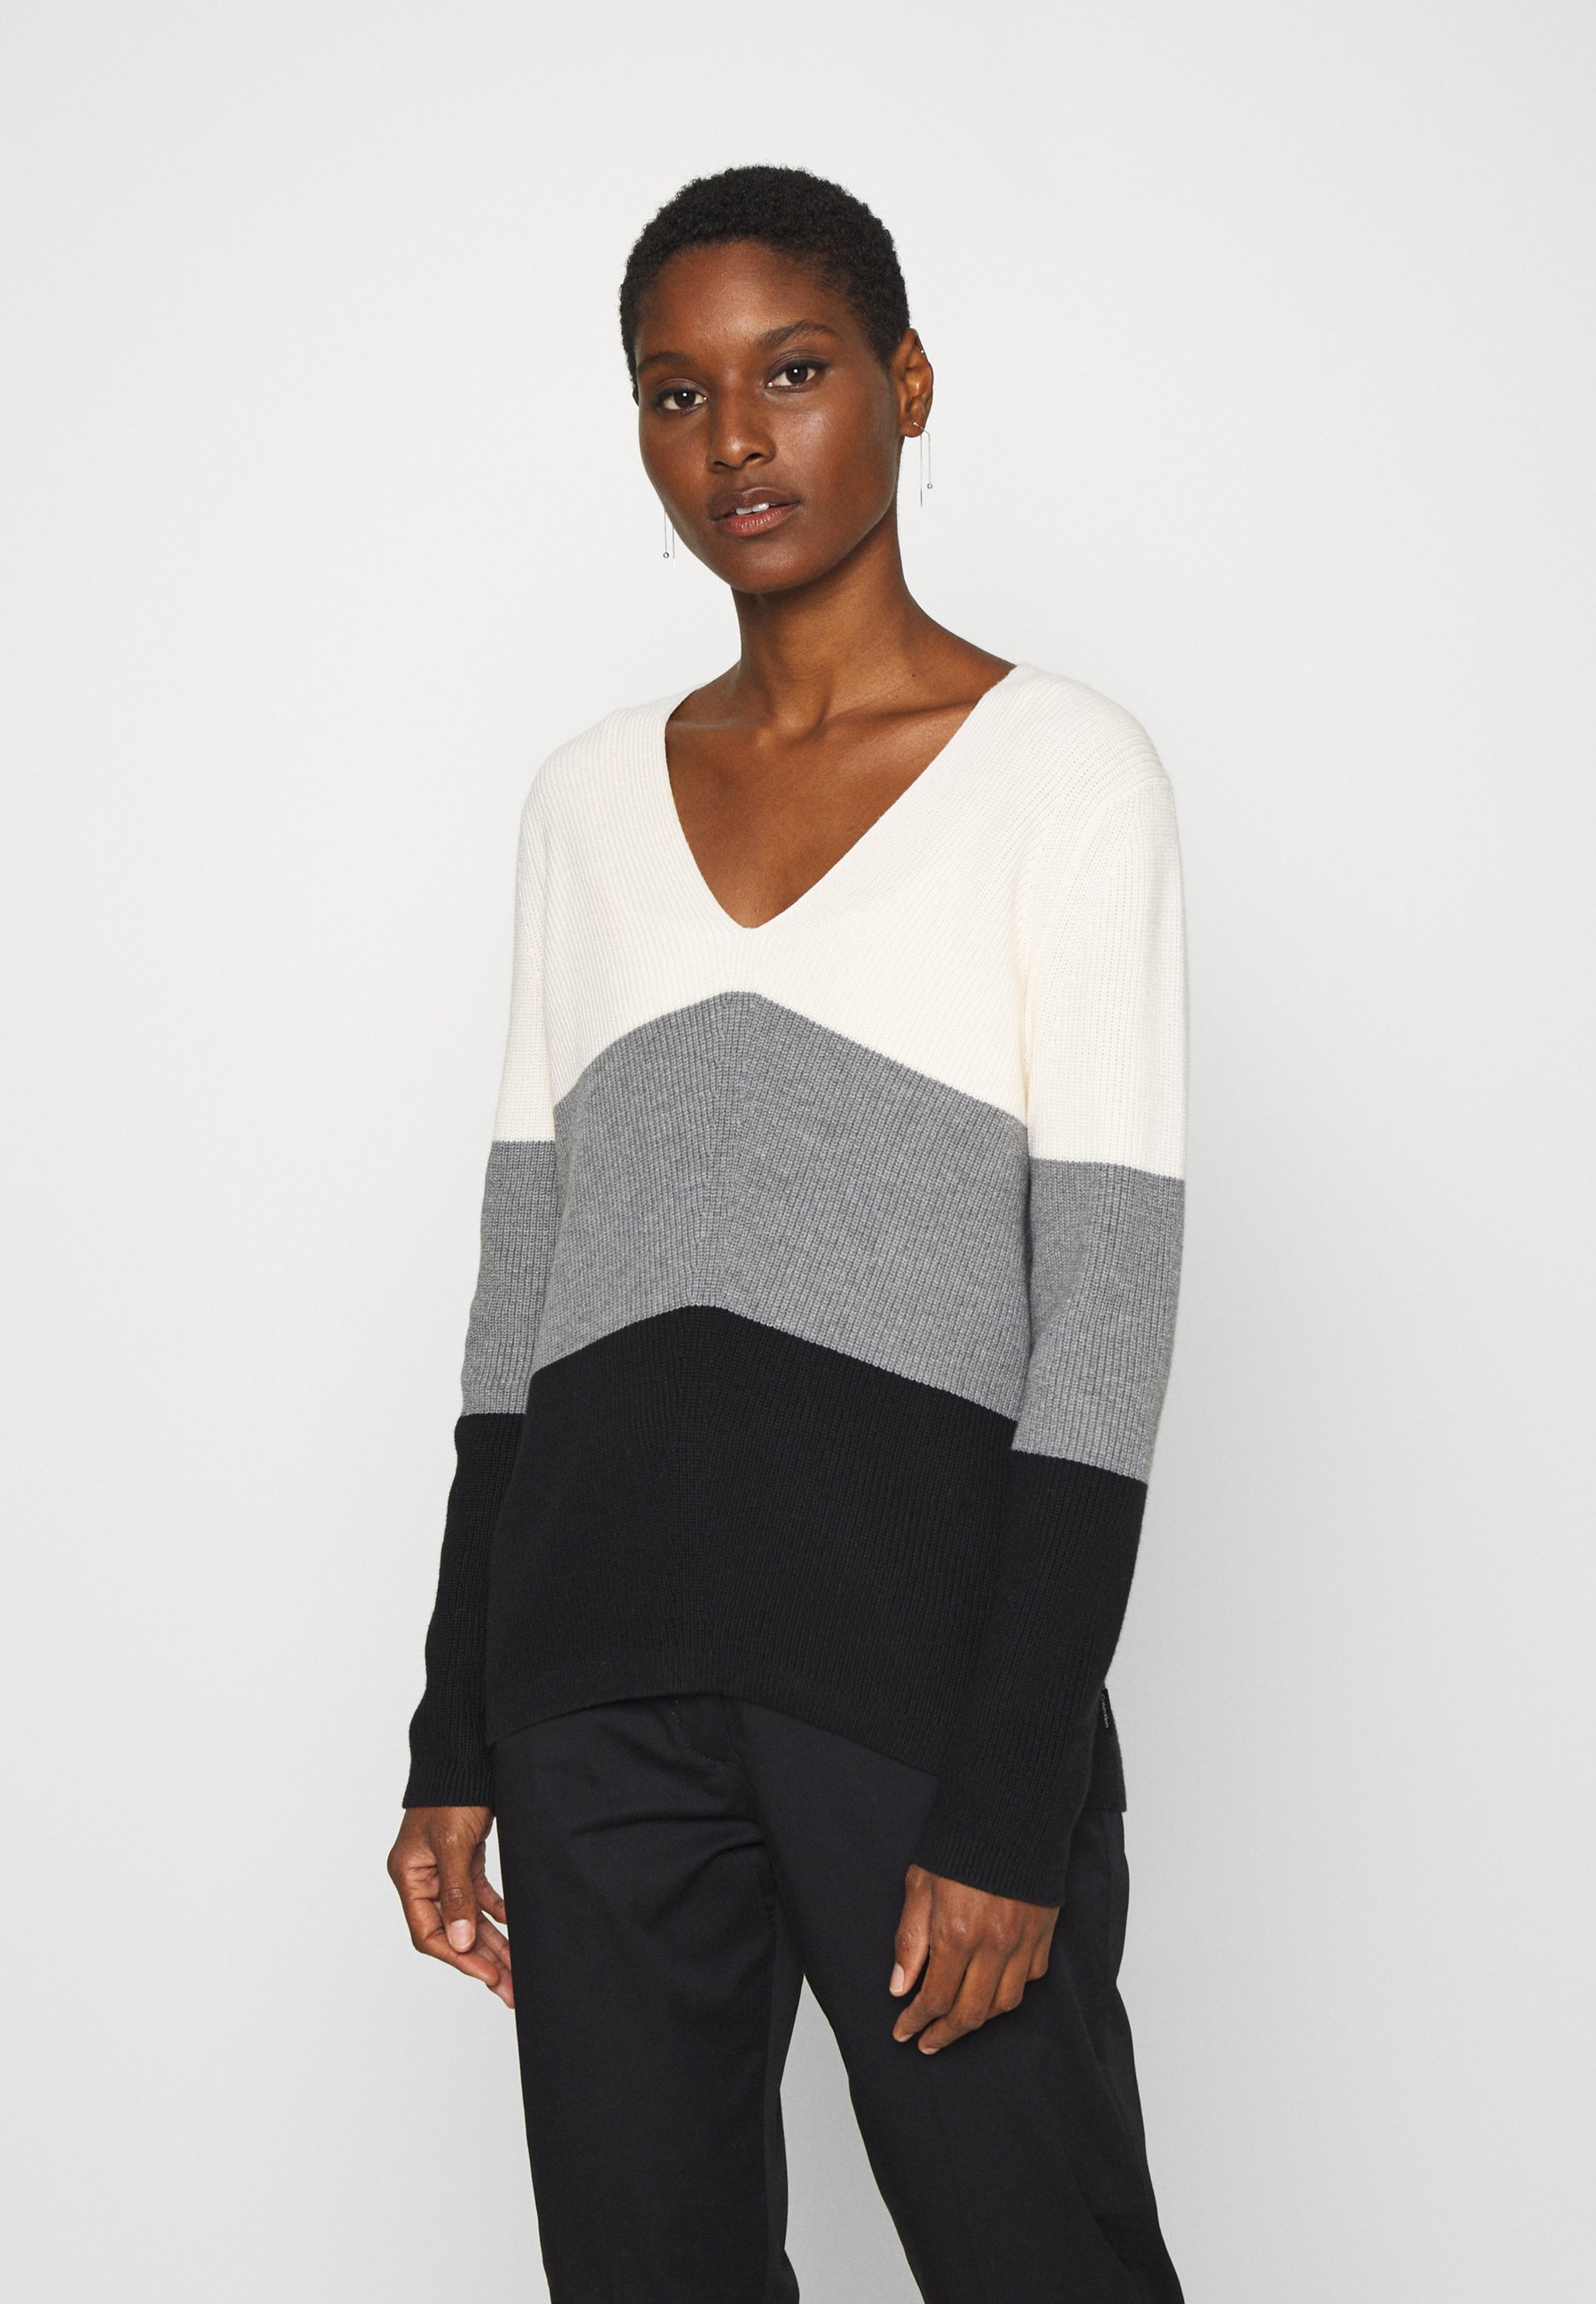 Super Specials Women's Clothing Calvin Klein COLOR BLOCK Jumper black/mid grey/white CrgJC3Cy2